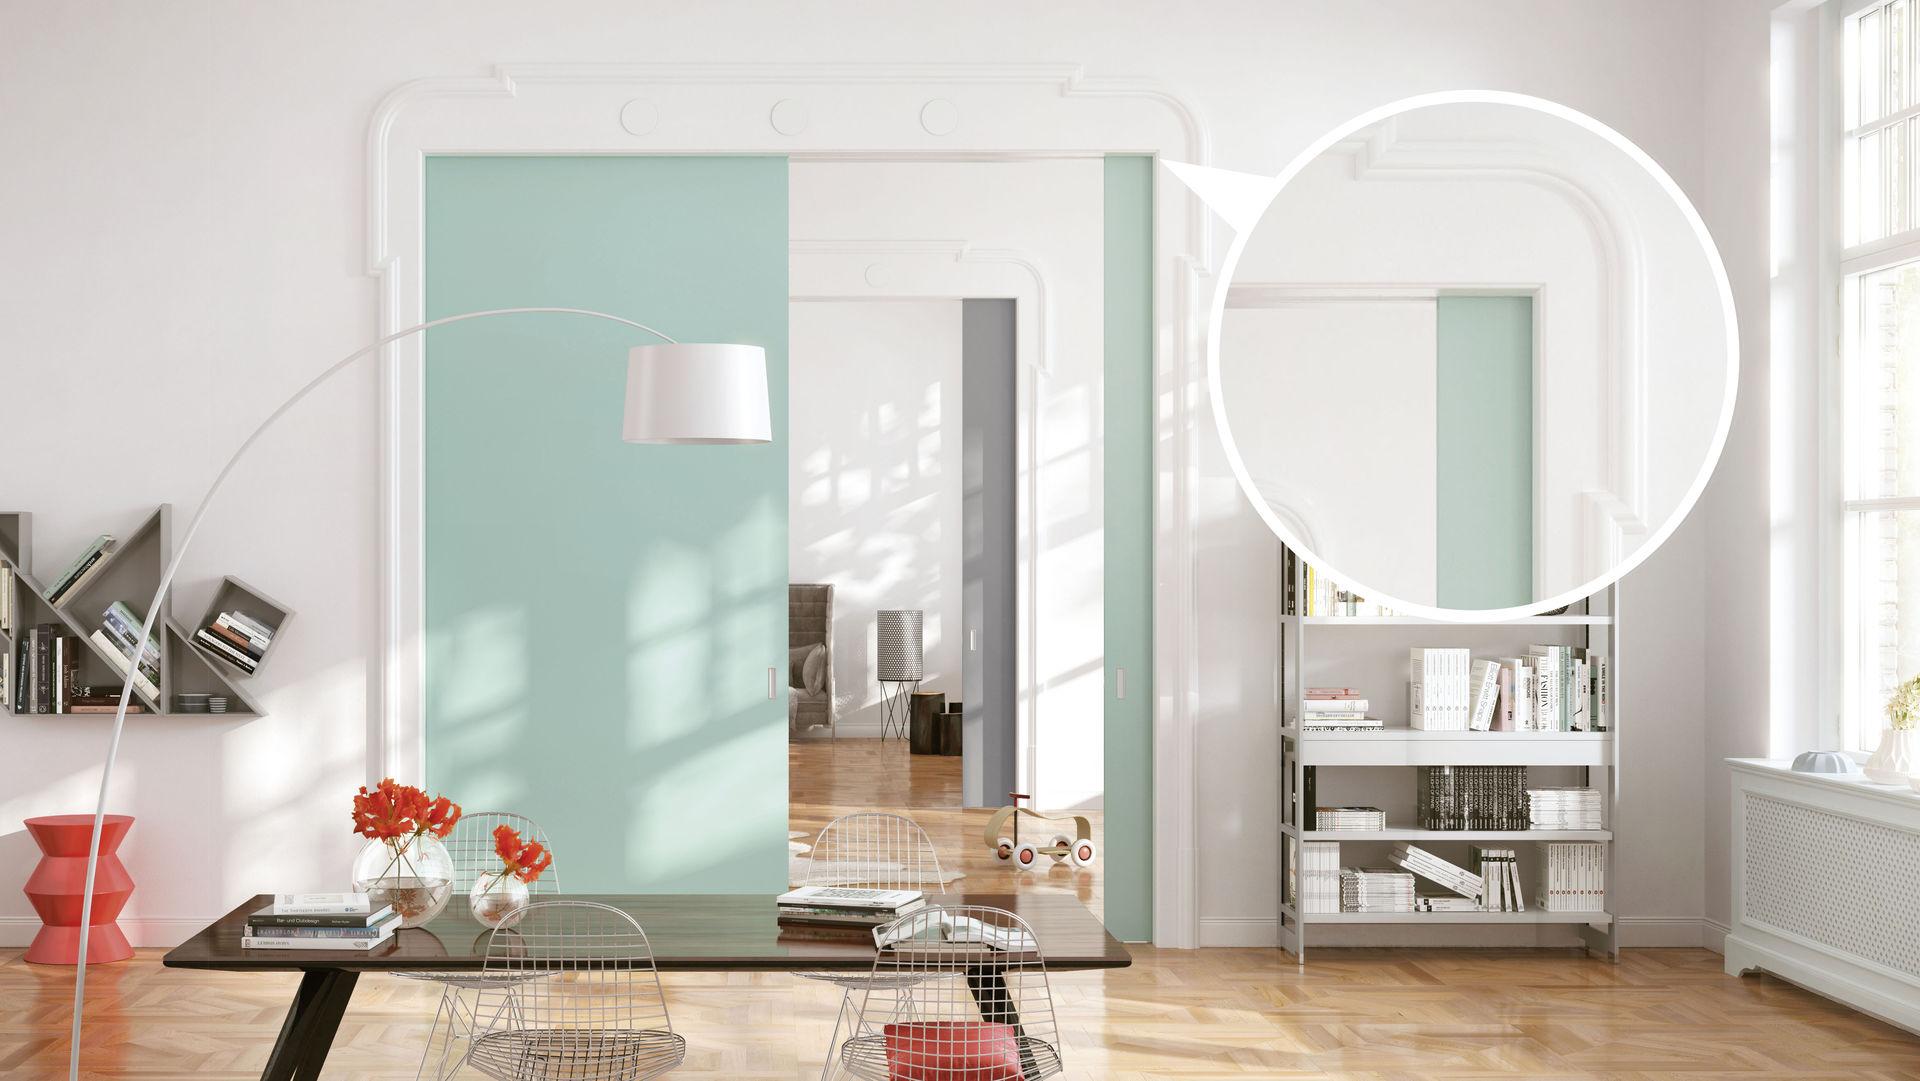 Milanodoors sliding doors The Space-Saving Wonder 3